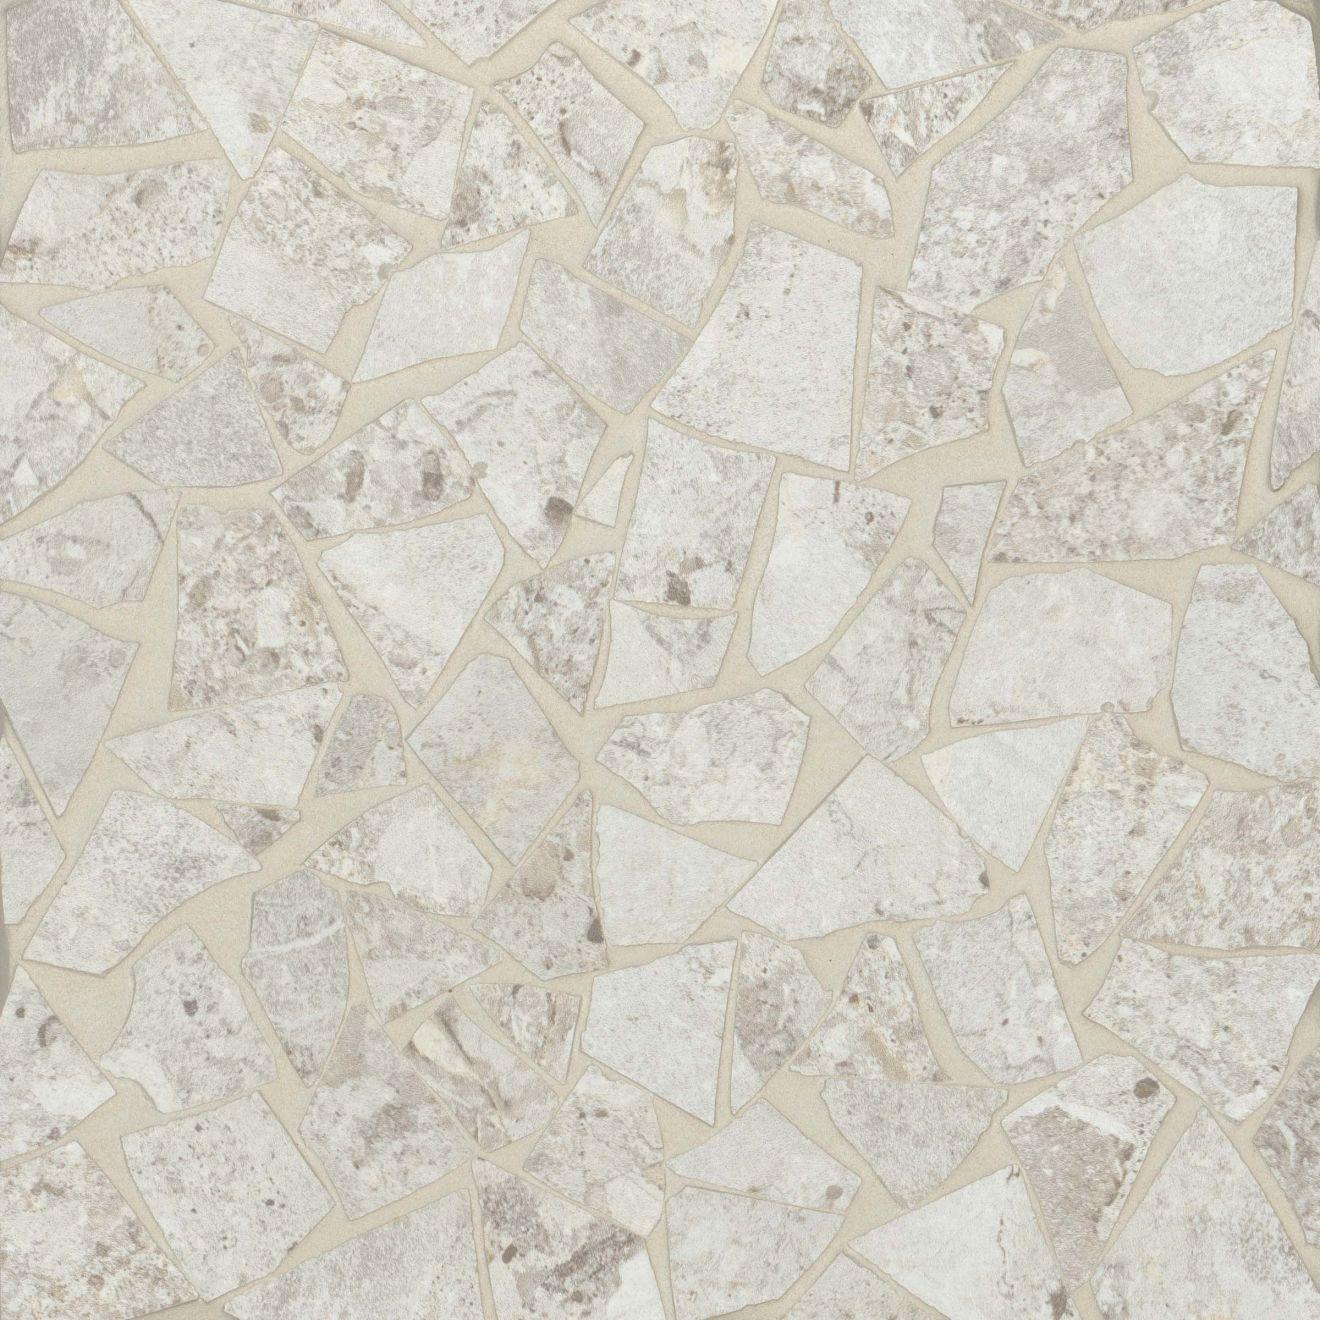 Frammenta Floor & Wall Mosaic in White